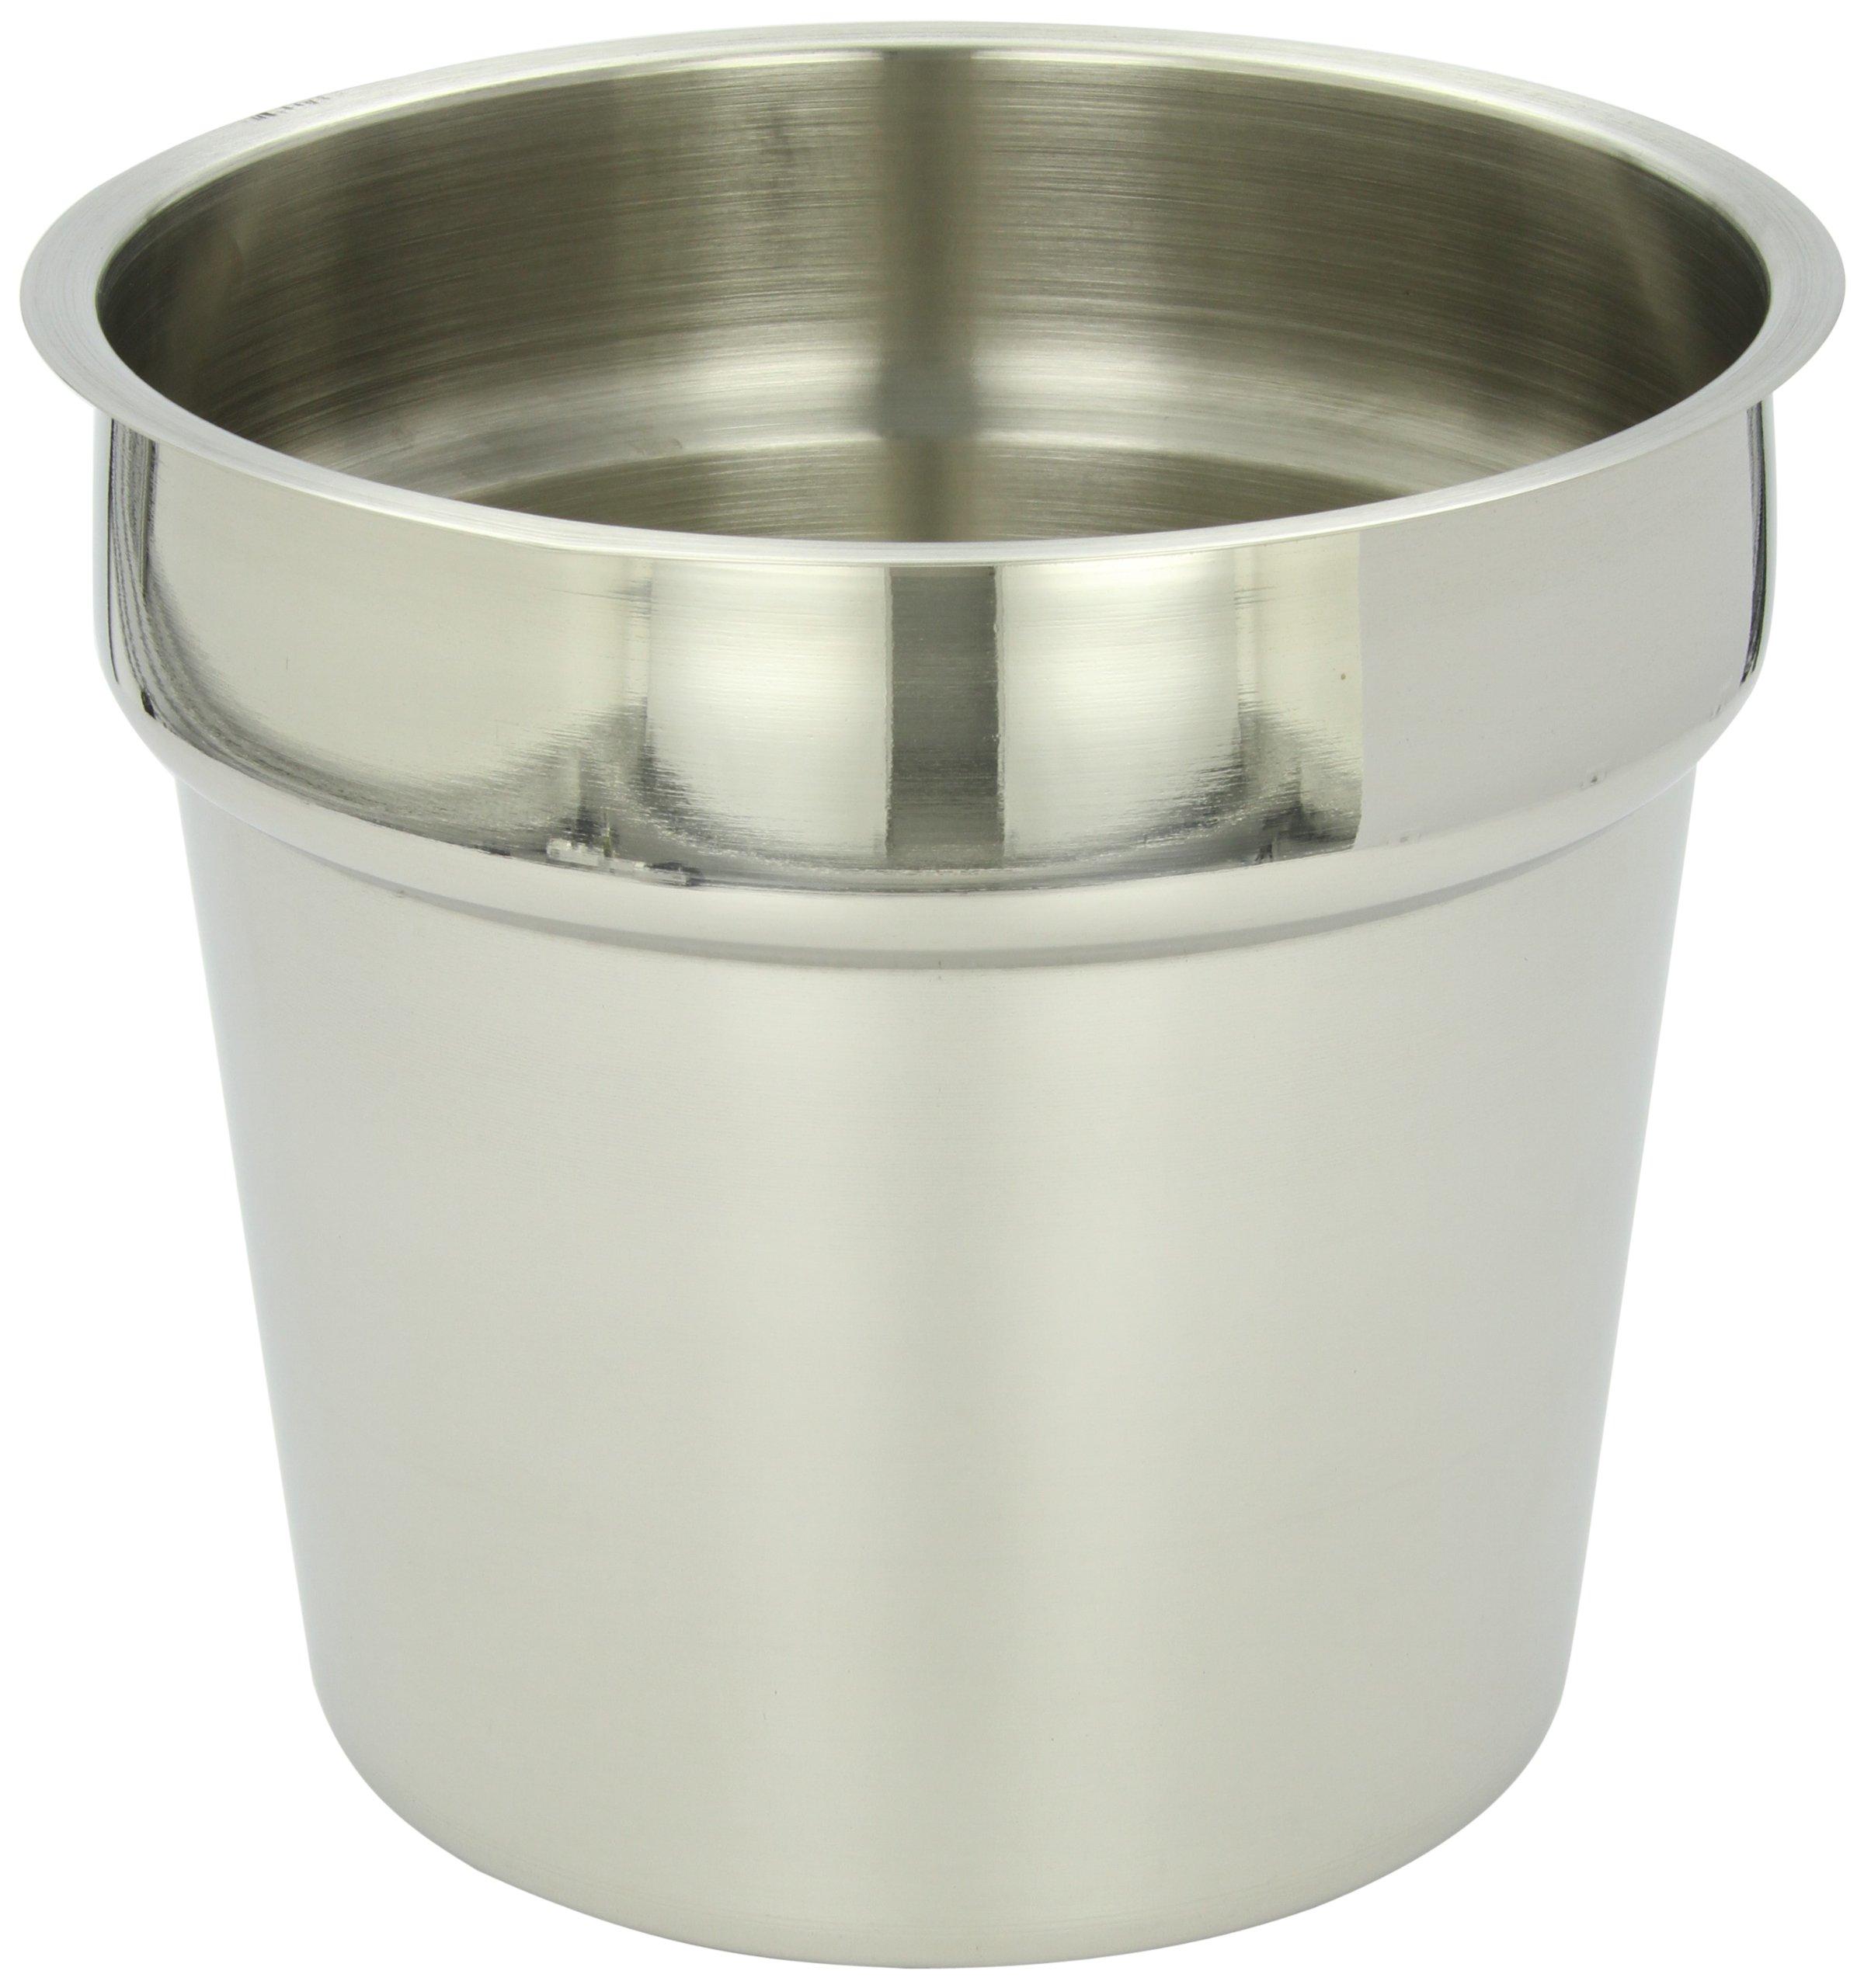 Benchmark 56750 Inset Pan, 7 qt Capacity, 9-1/2'' Diameter x 8-1/4'' Height